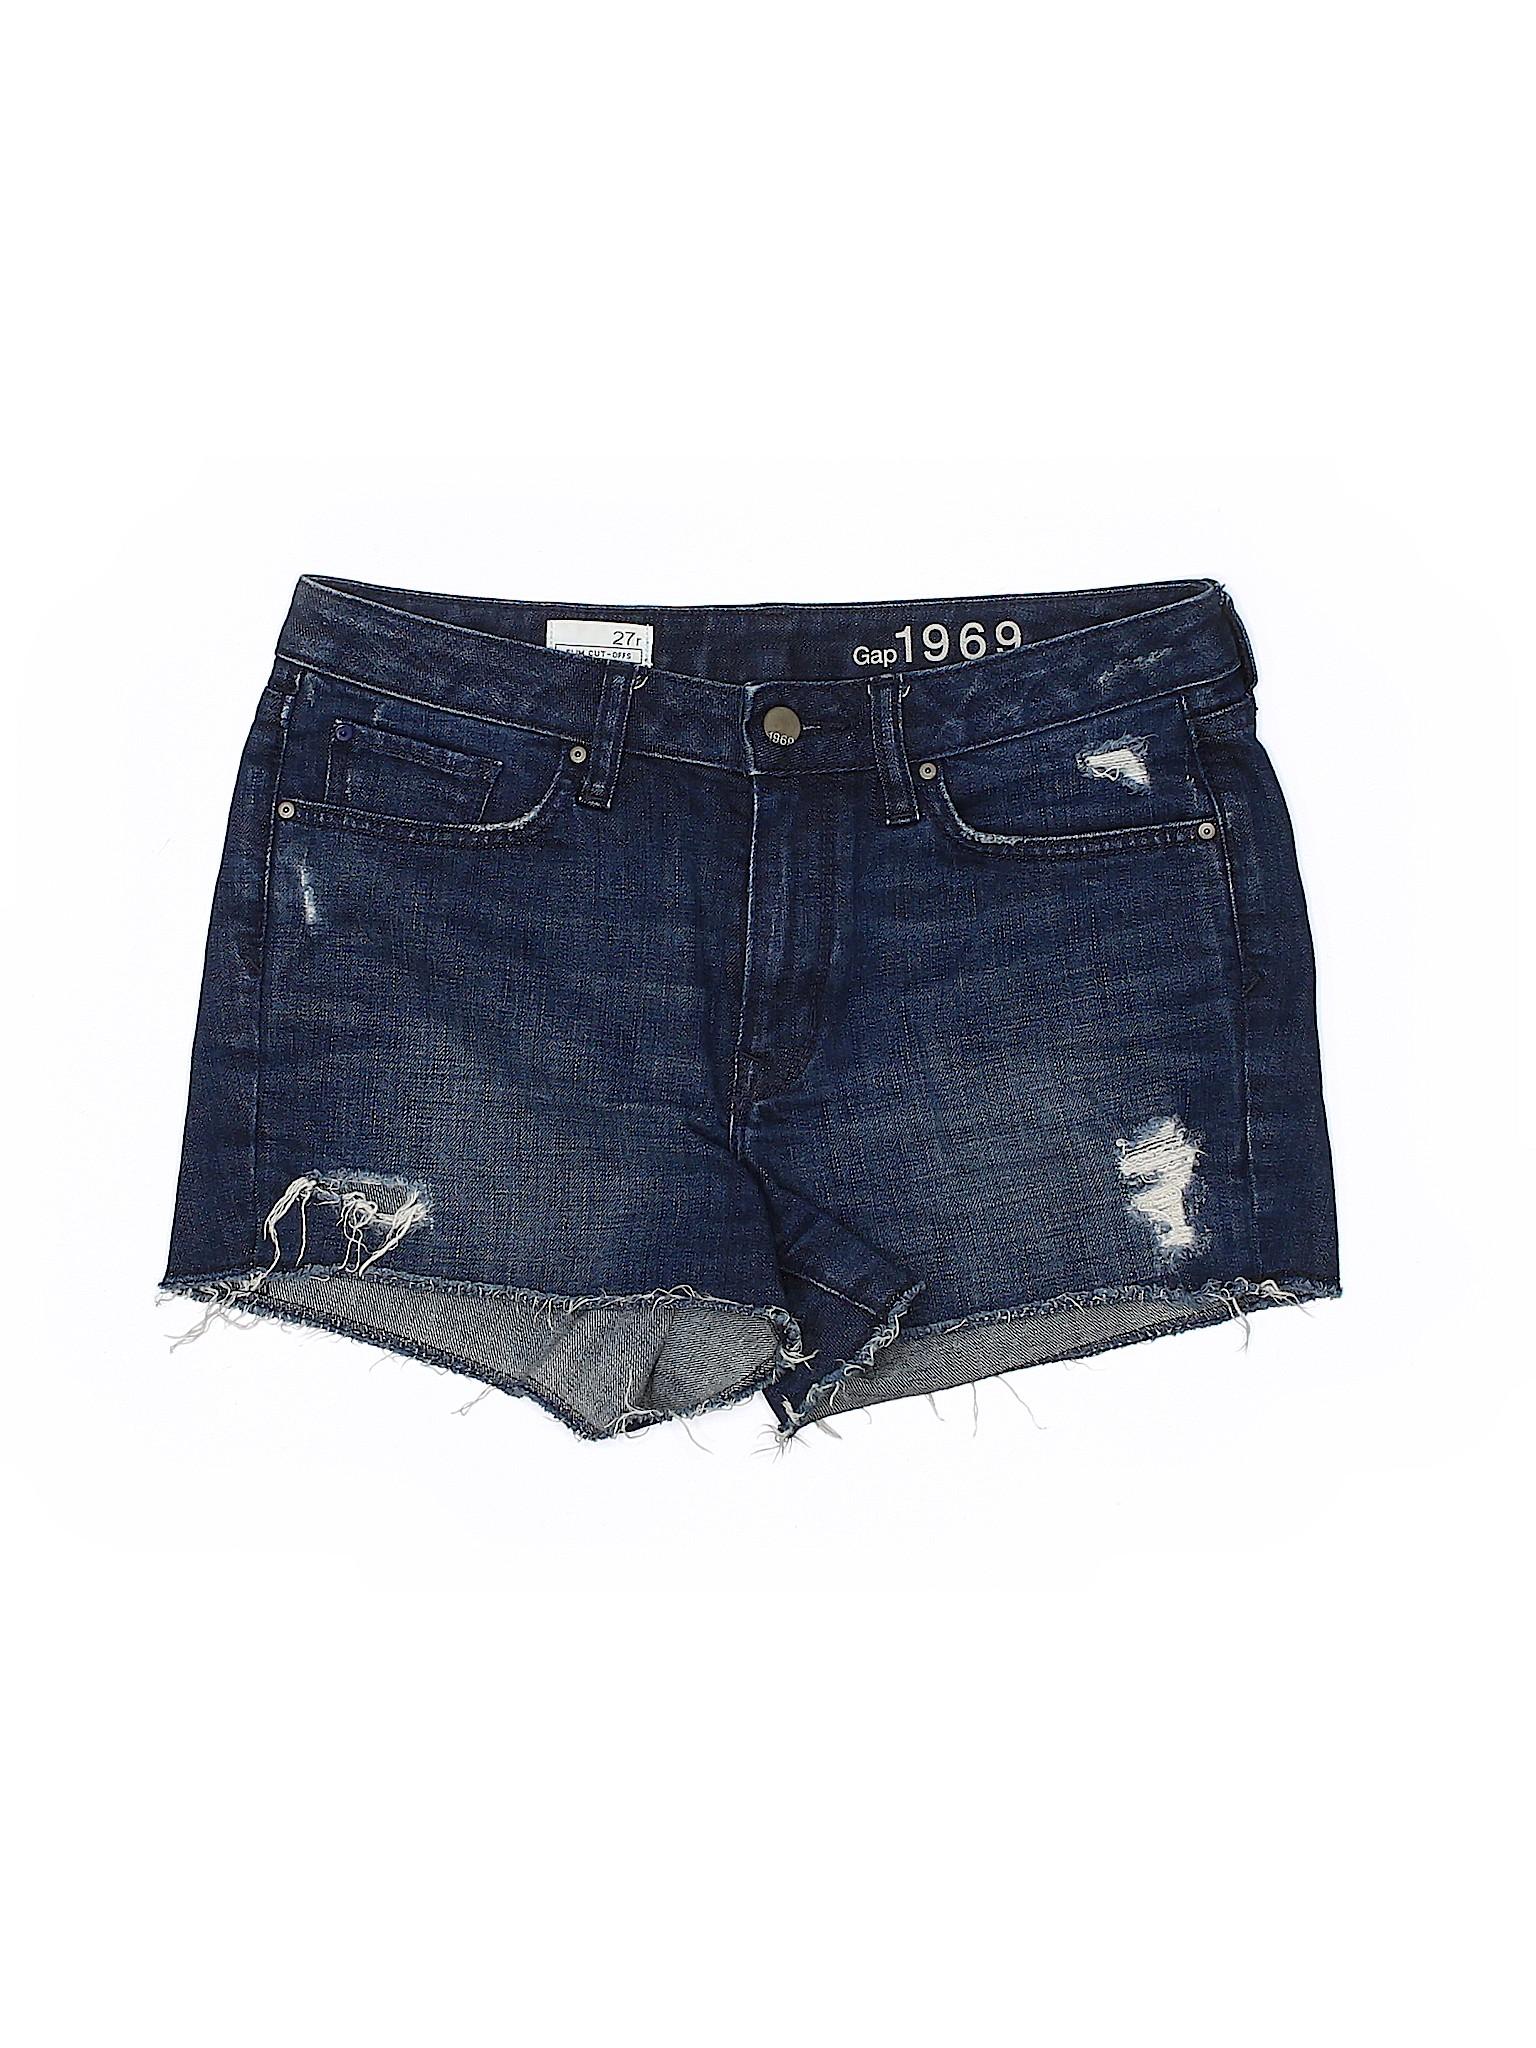 Gap Boutique Boutique Denim Shorts winter winter tqwU5Fwa